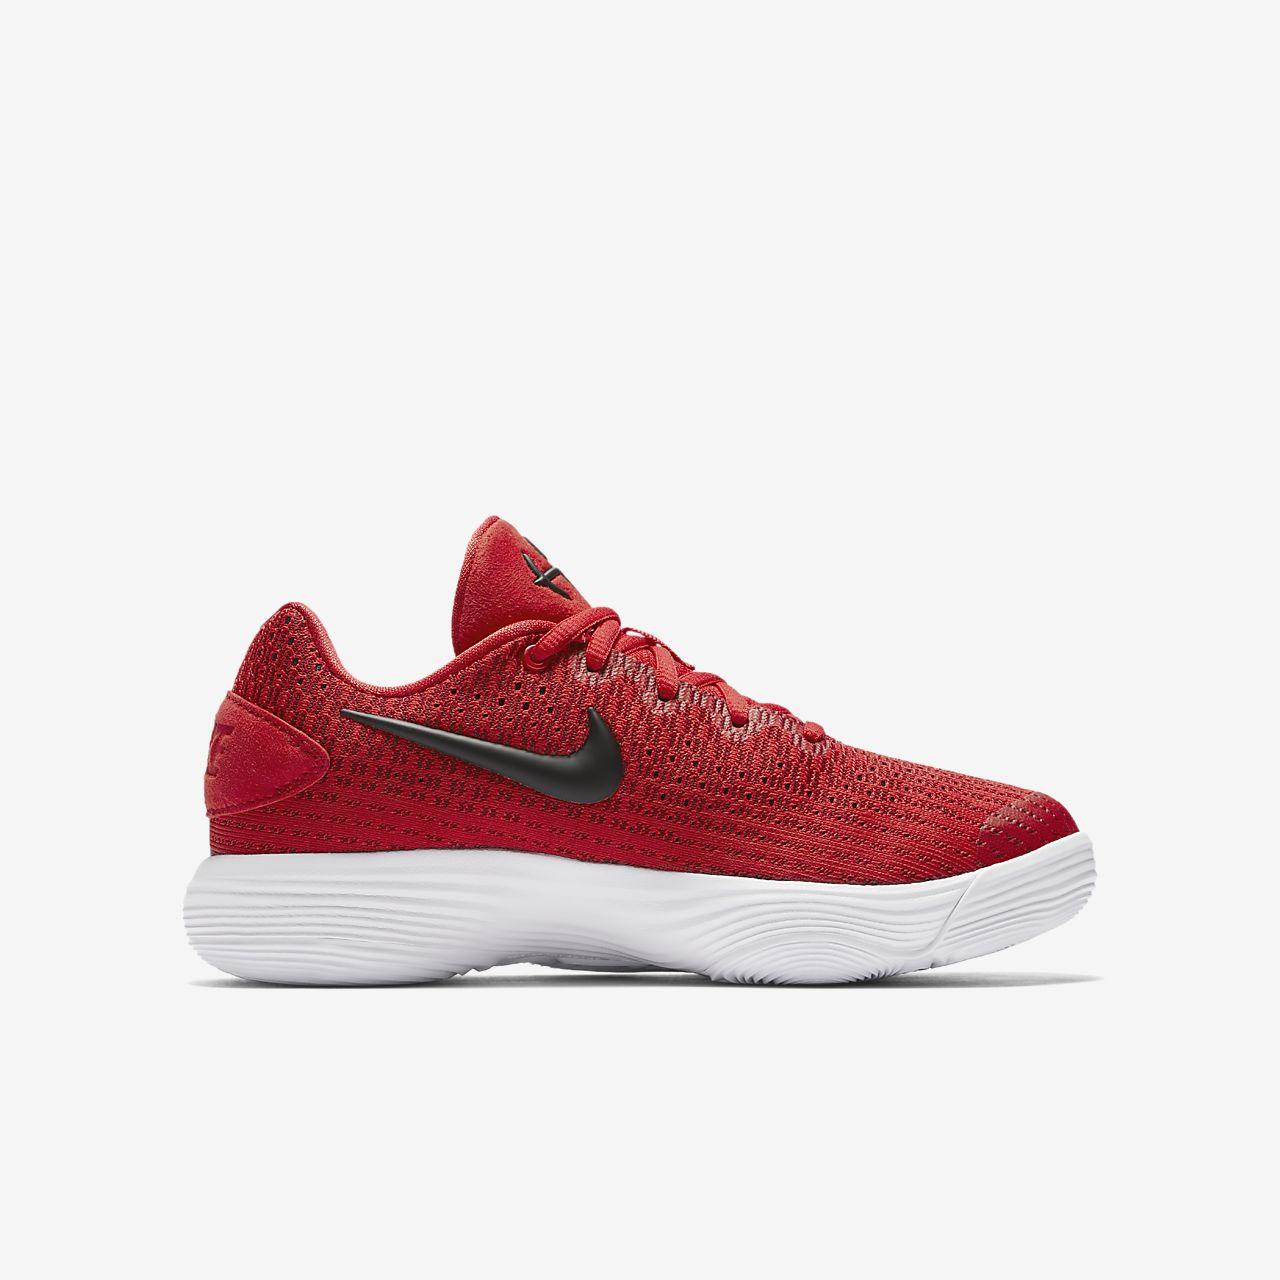 los angeles b52b0 e52fa hyper rev nike hyperdunk youth basketball shoes